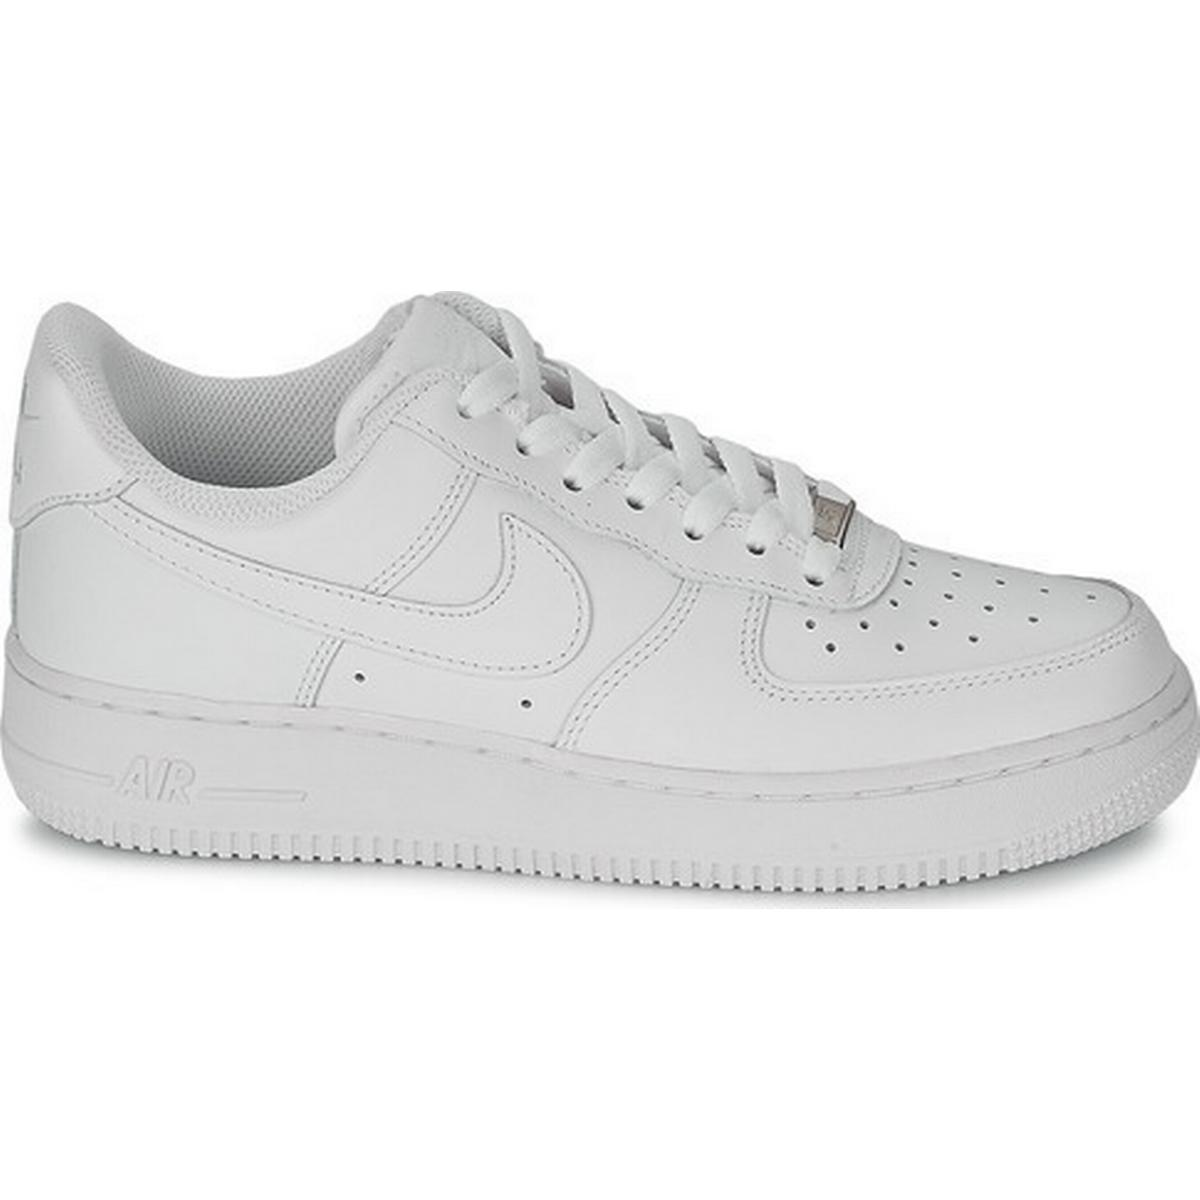 berømte fodtøj dame nike air Force 1